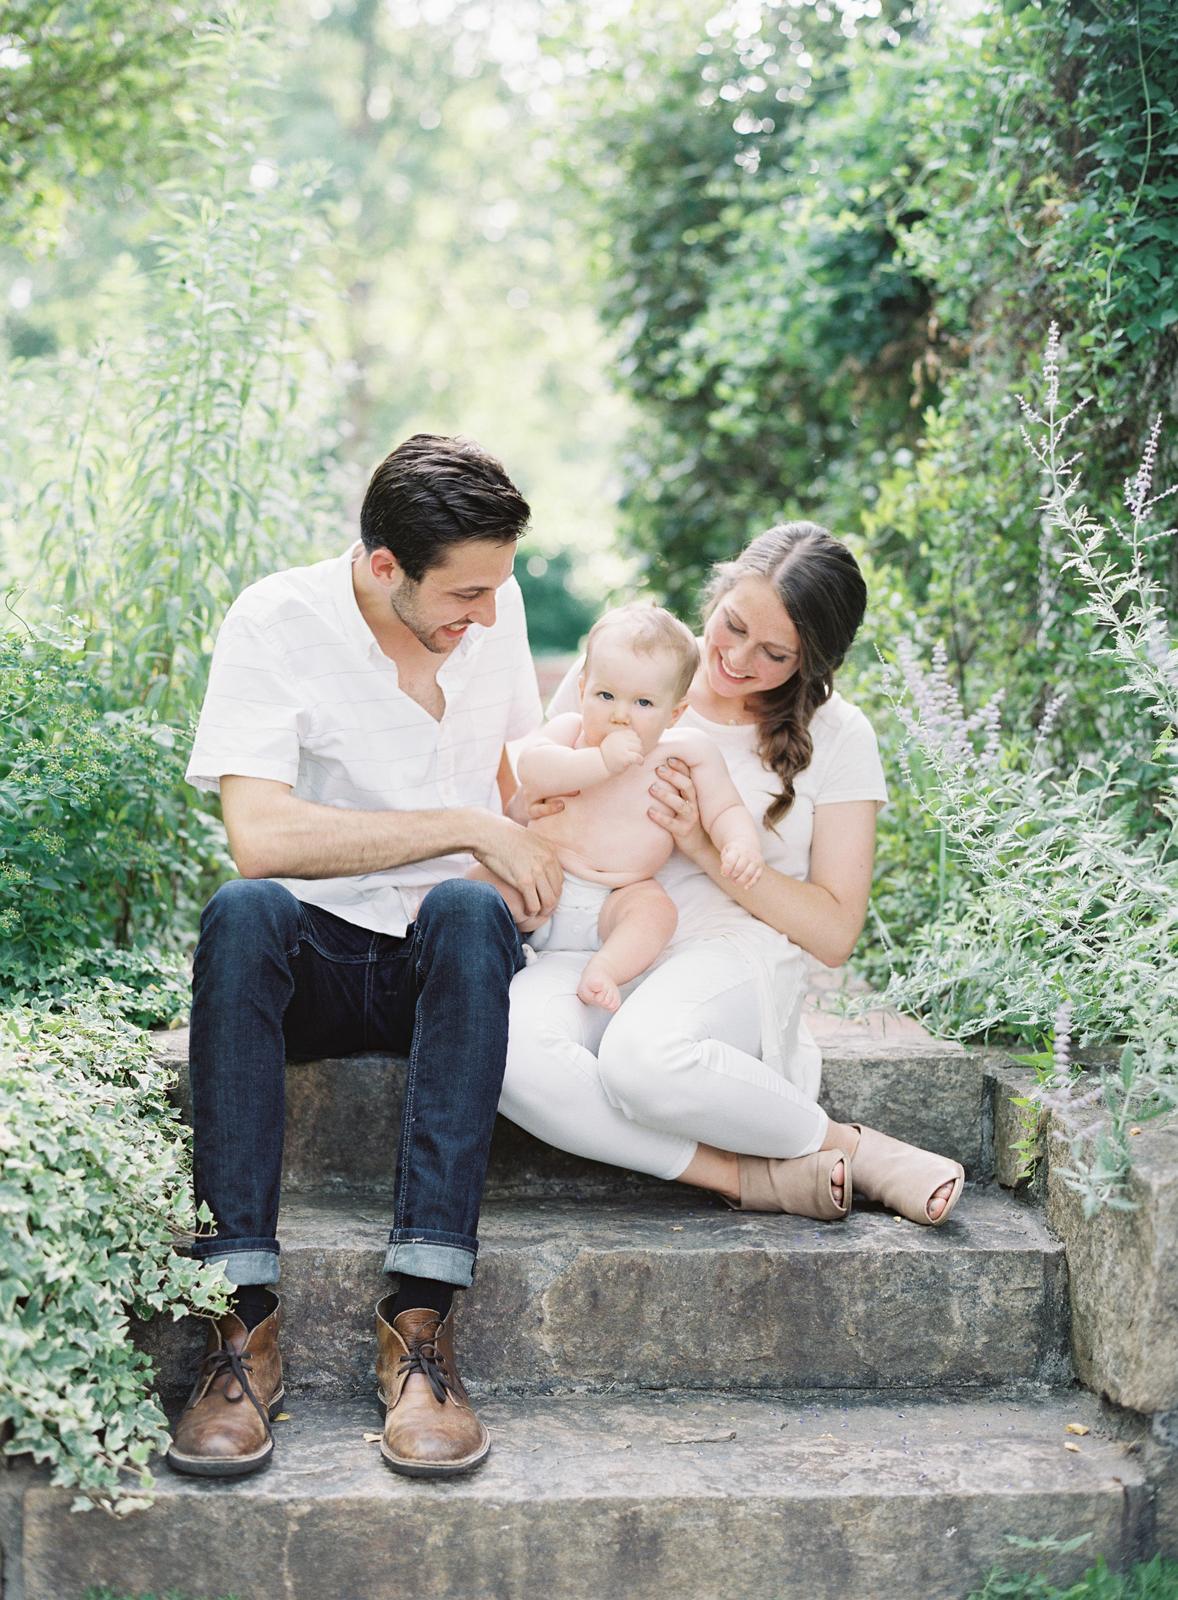 SawyerBaird2016_Family (12 of 107).JPG